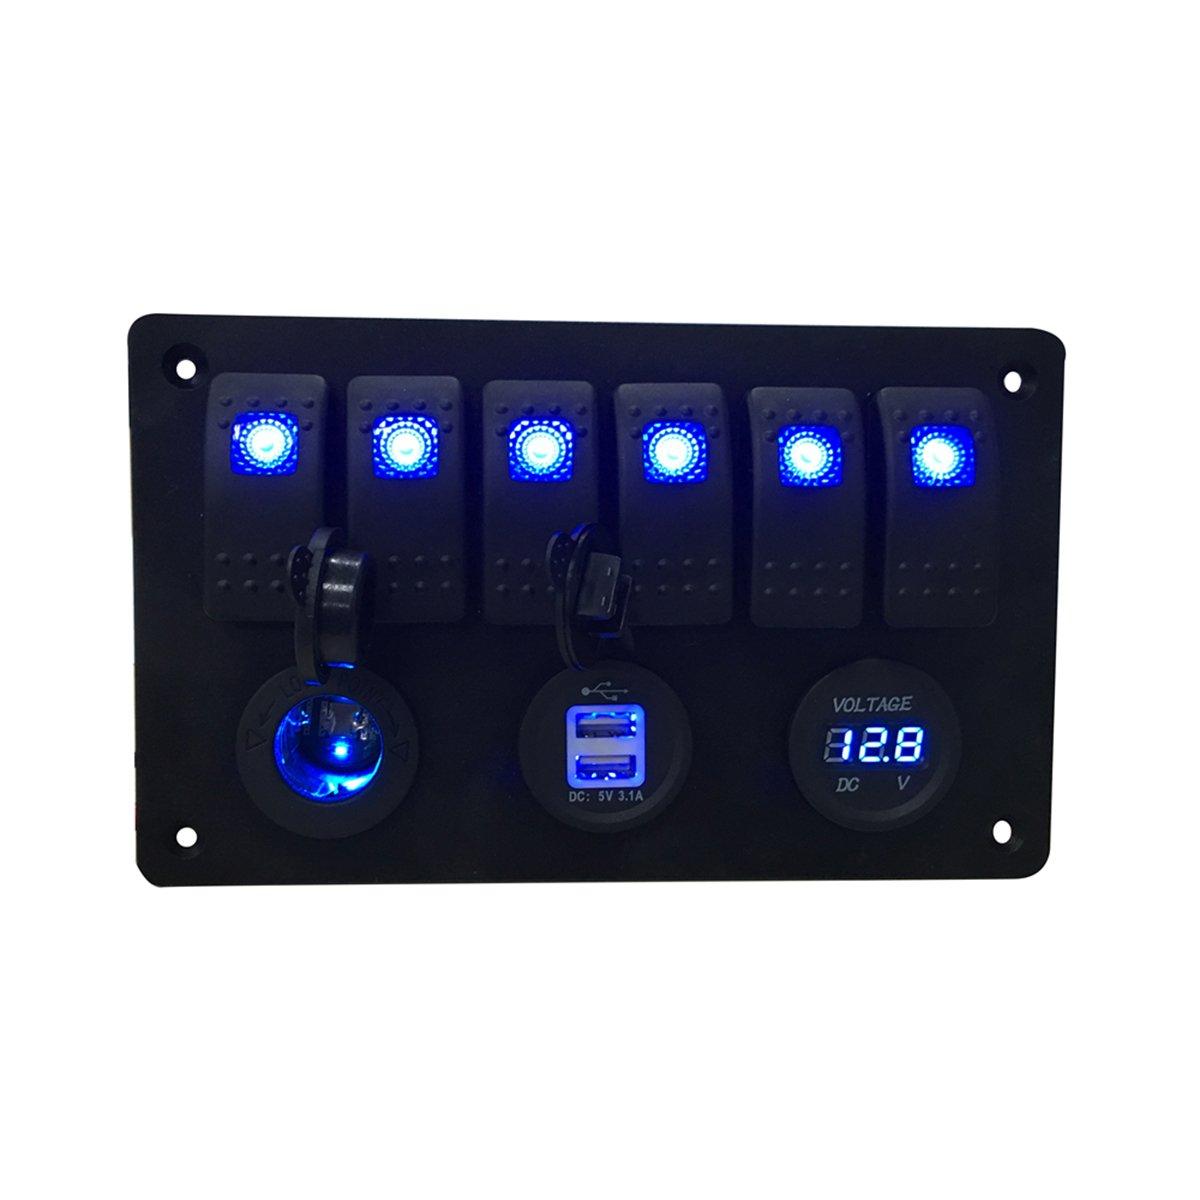 WINOMO DIY Switch 6 Gang Car Circuit Fuse Rocker Switch Panel With Voltmeter for Rv Van